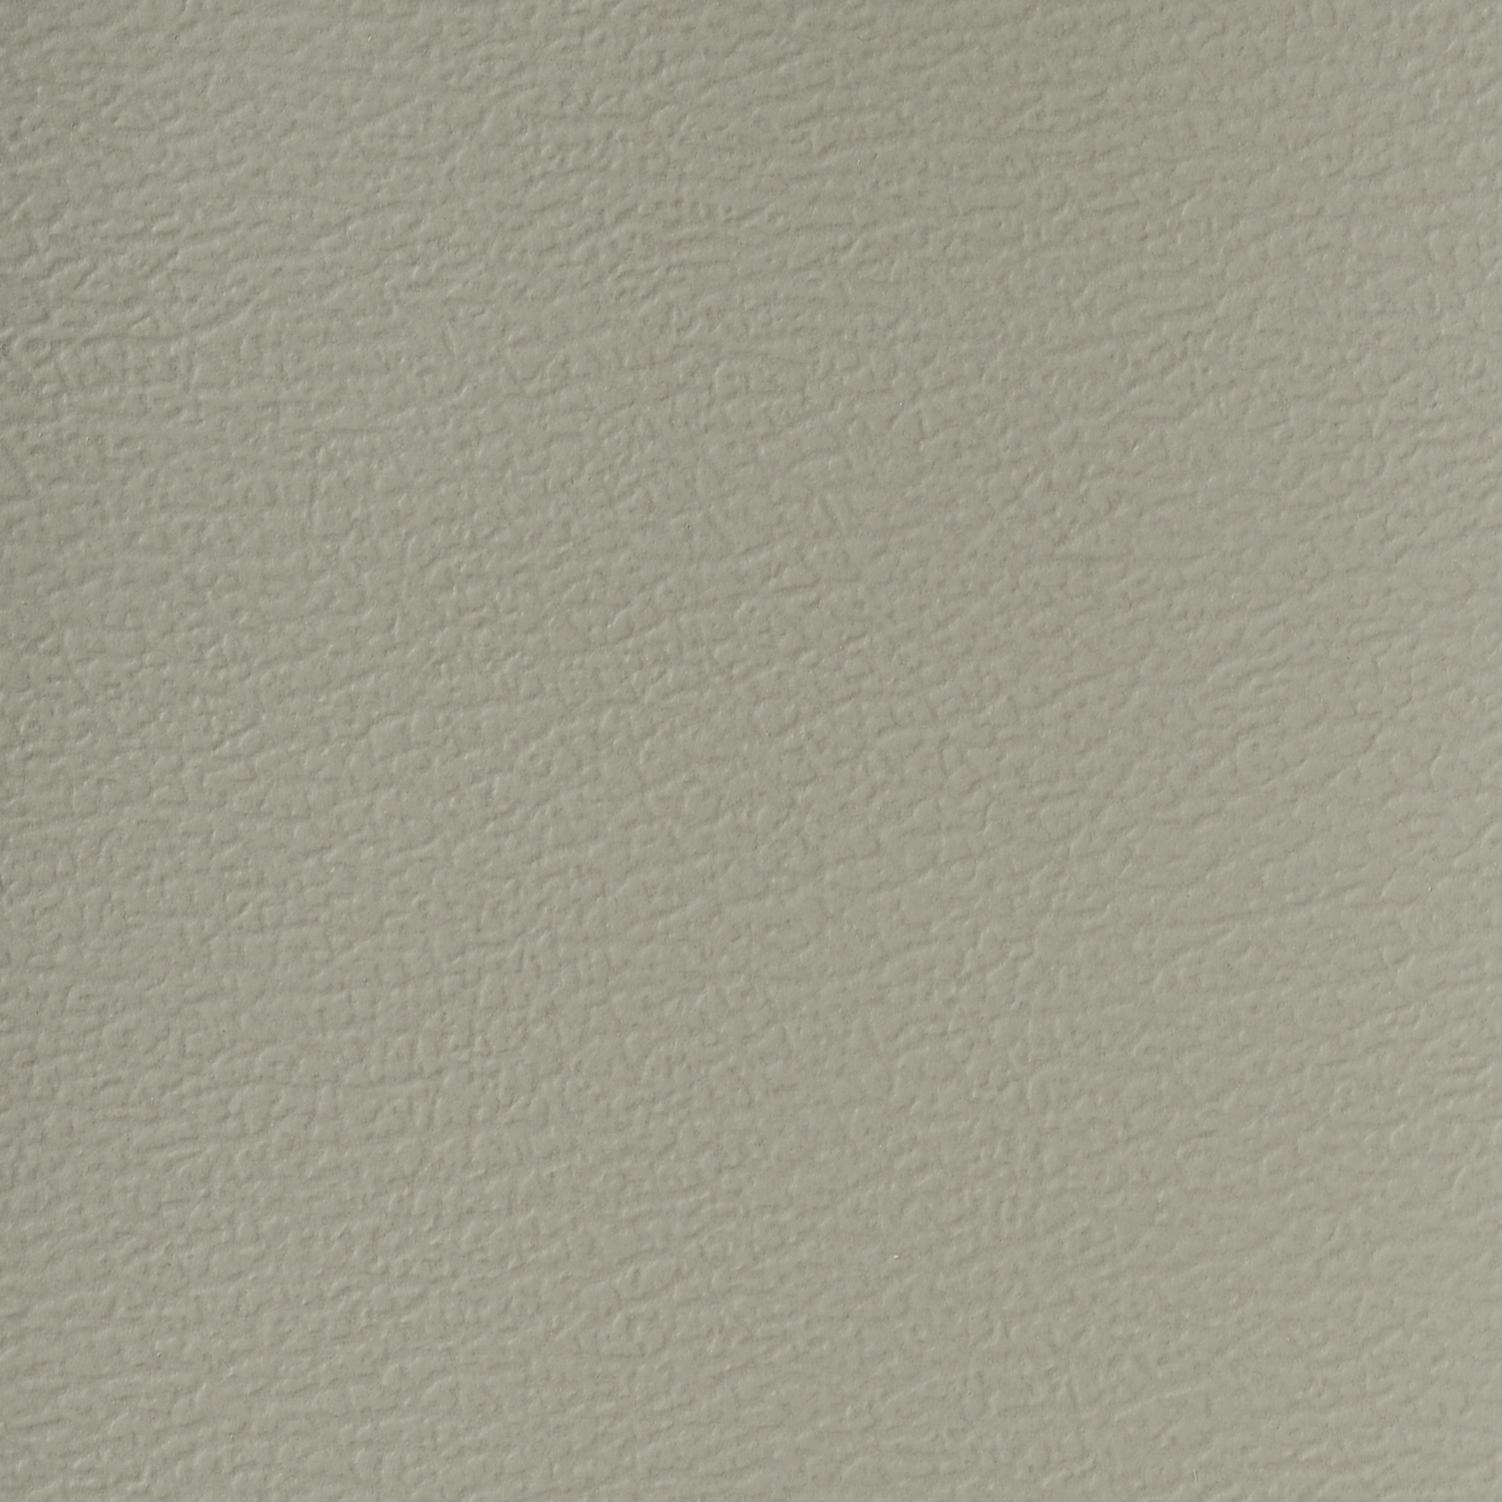 SAND GRAY   XL-2060